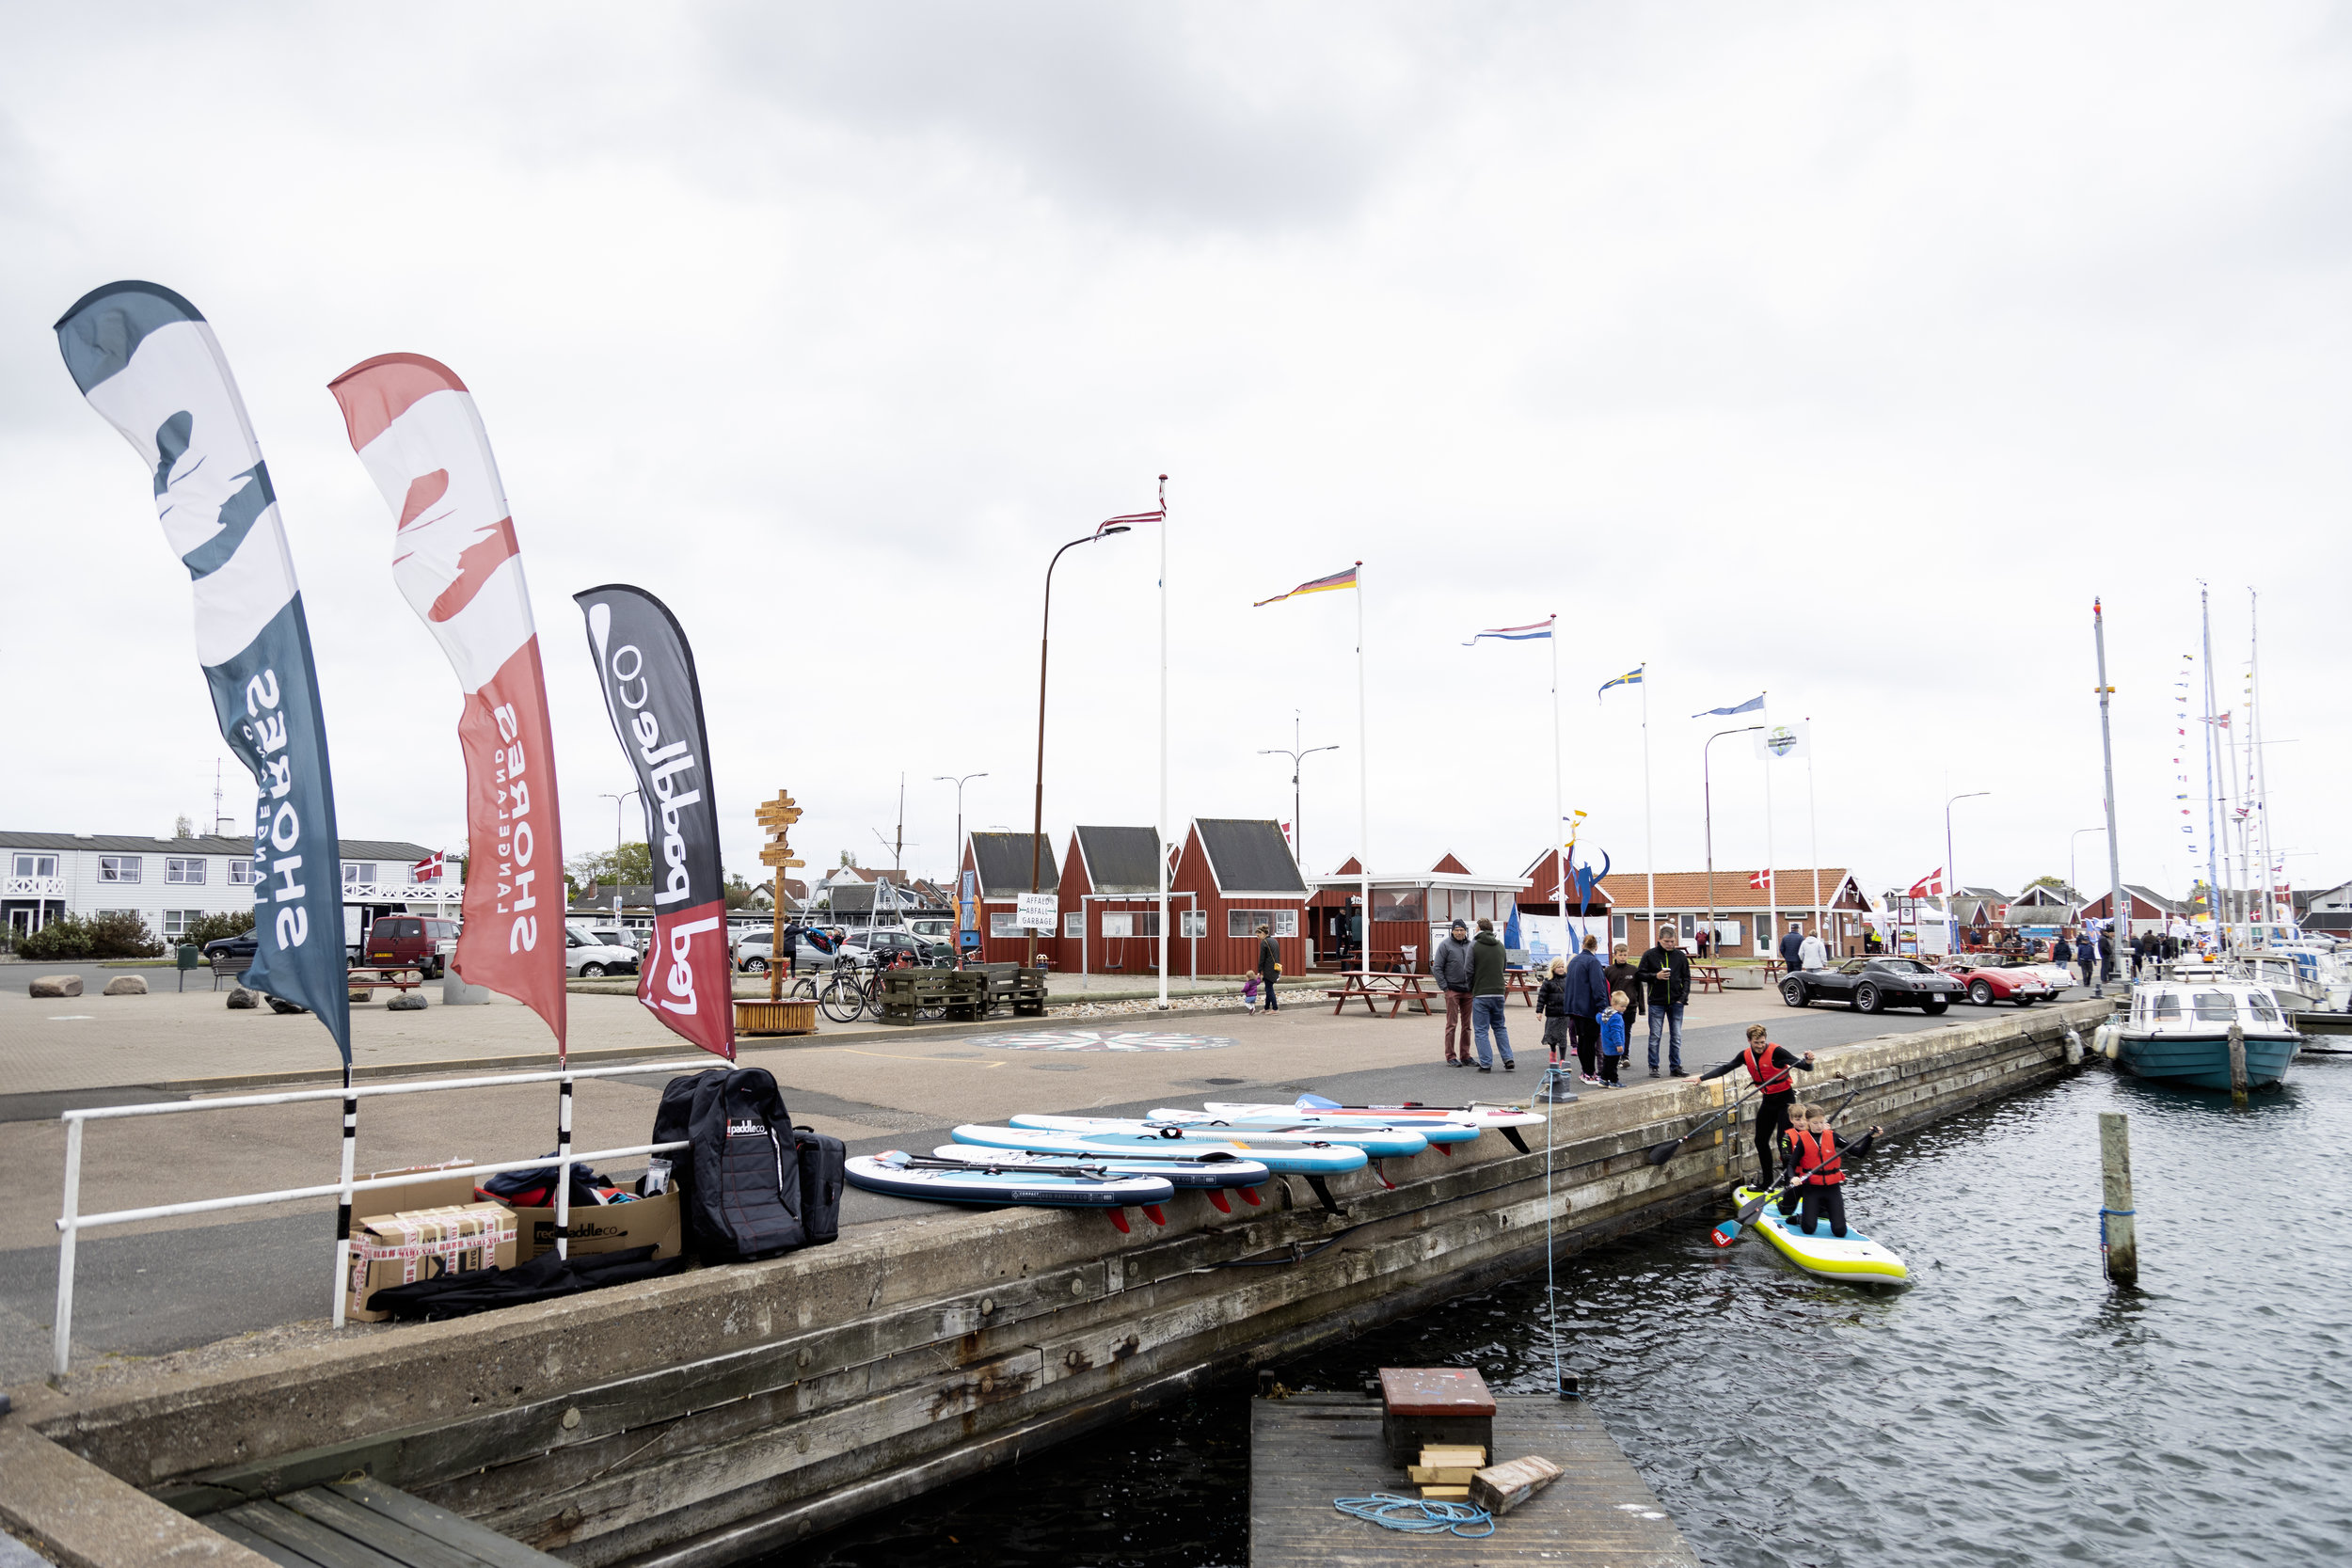 20190525_Havnens Dag Bagenkop_ foto Kristoffer Juel Poulsen_0208.jpg